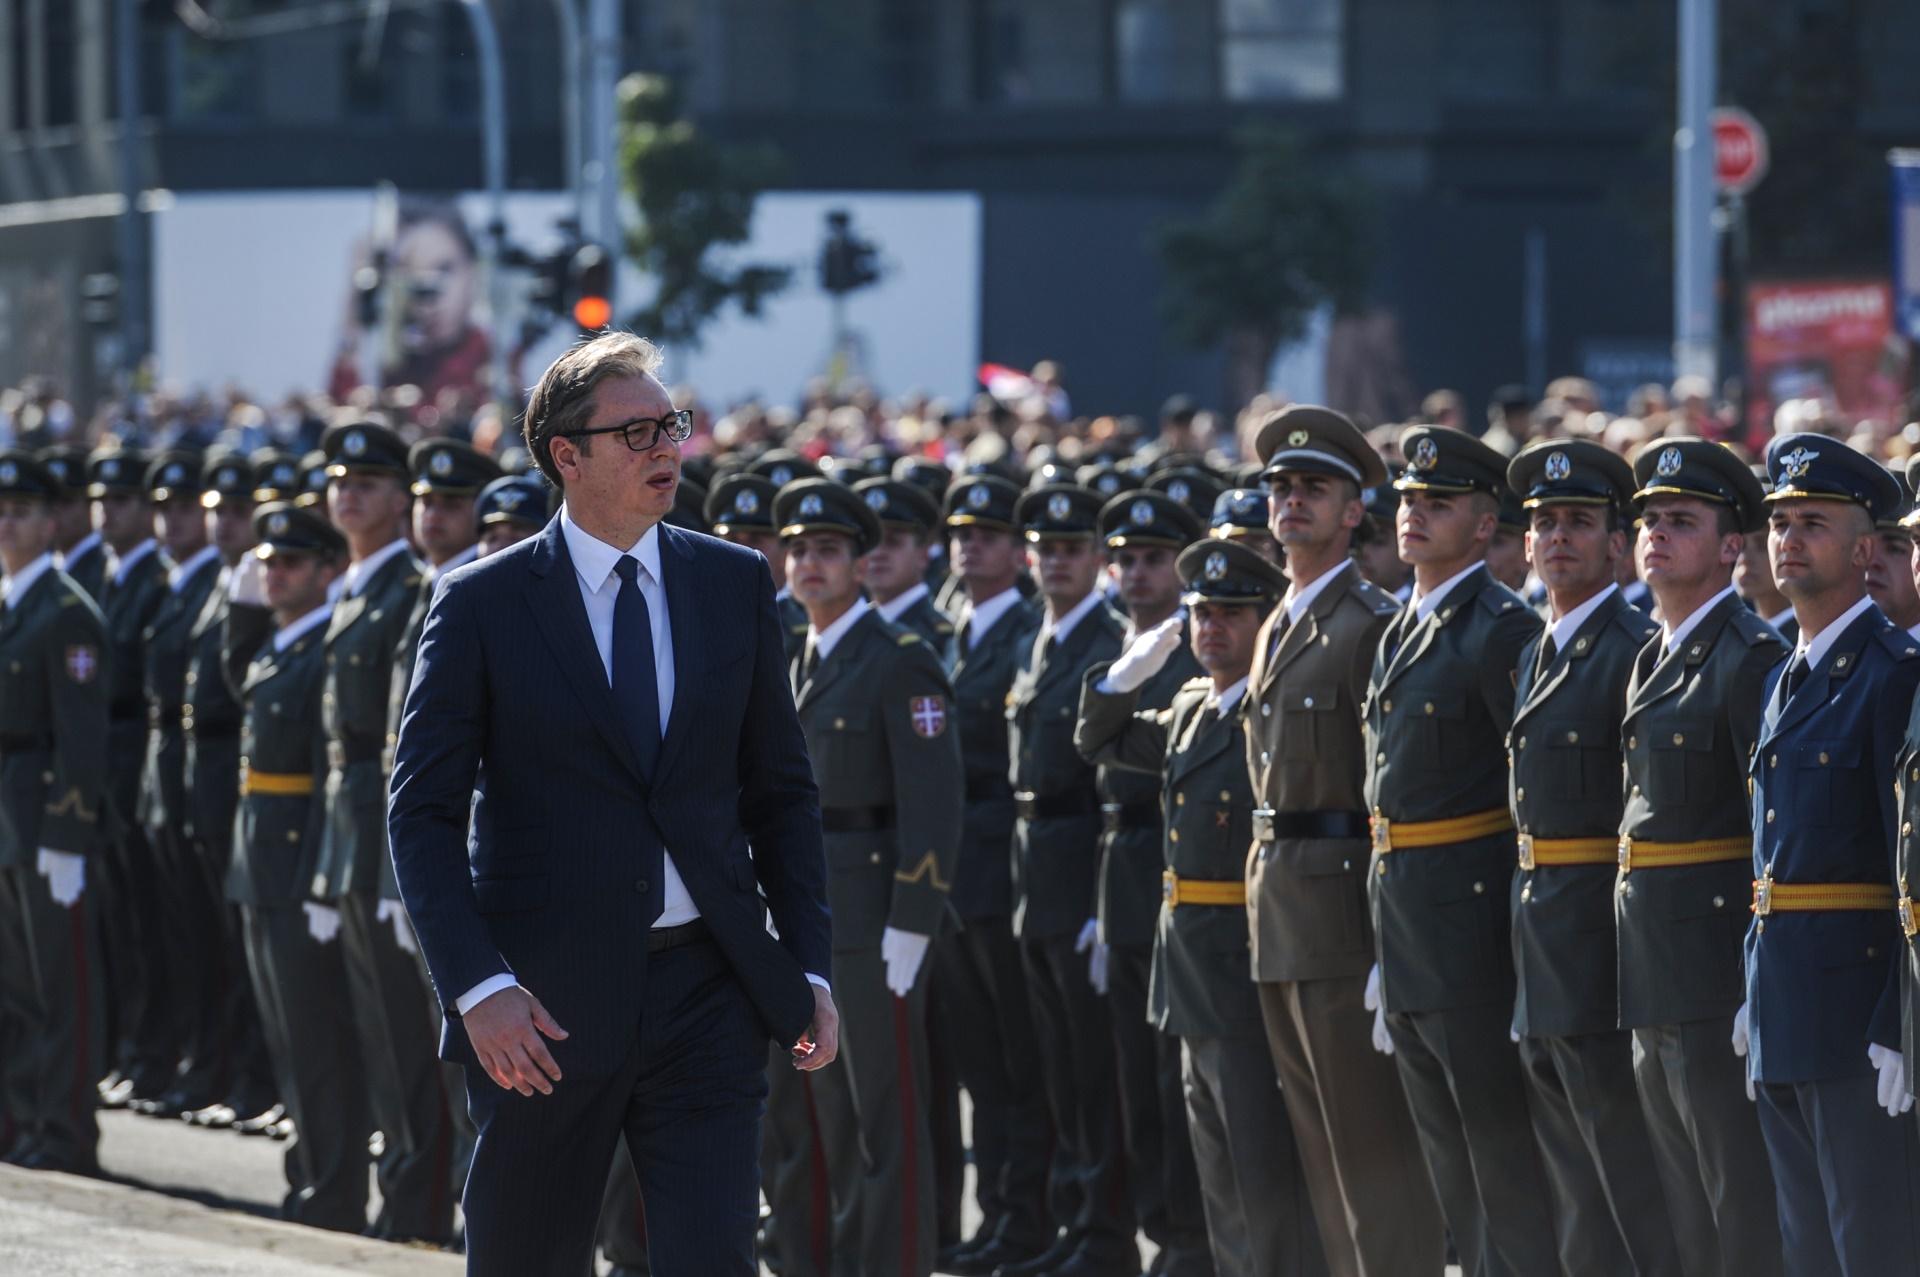 Vojska Srbije garant mira i stabilnosti,dolaze najbolji